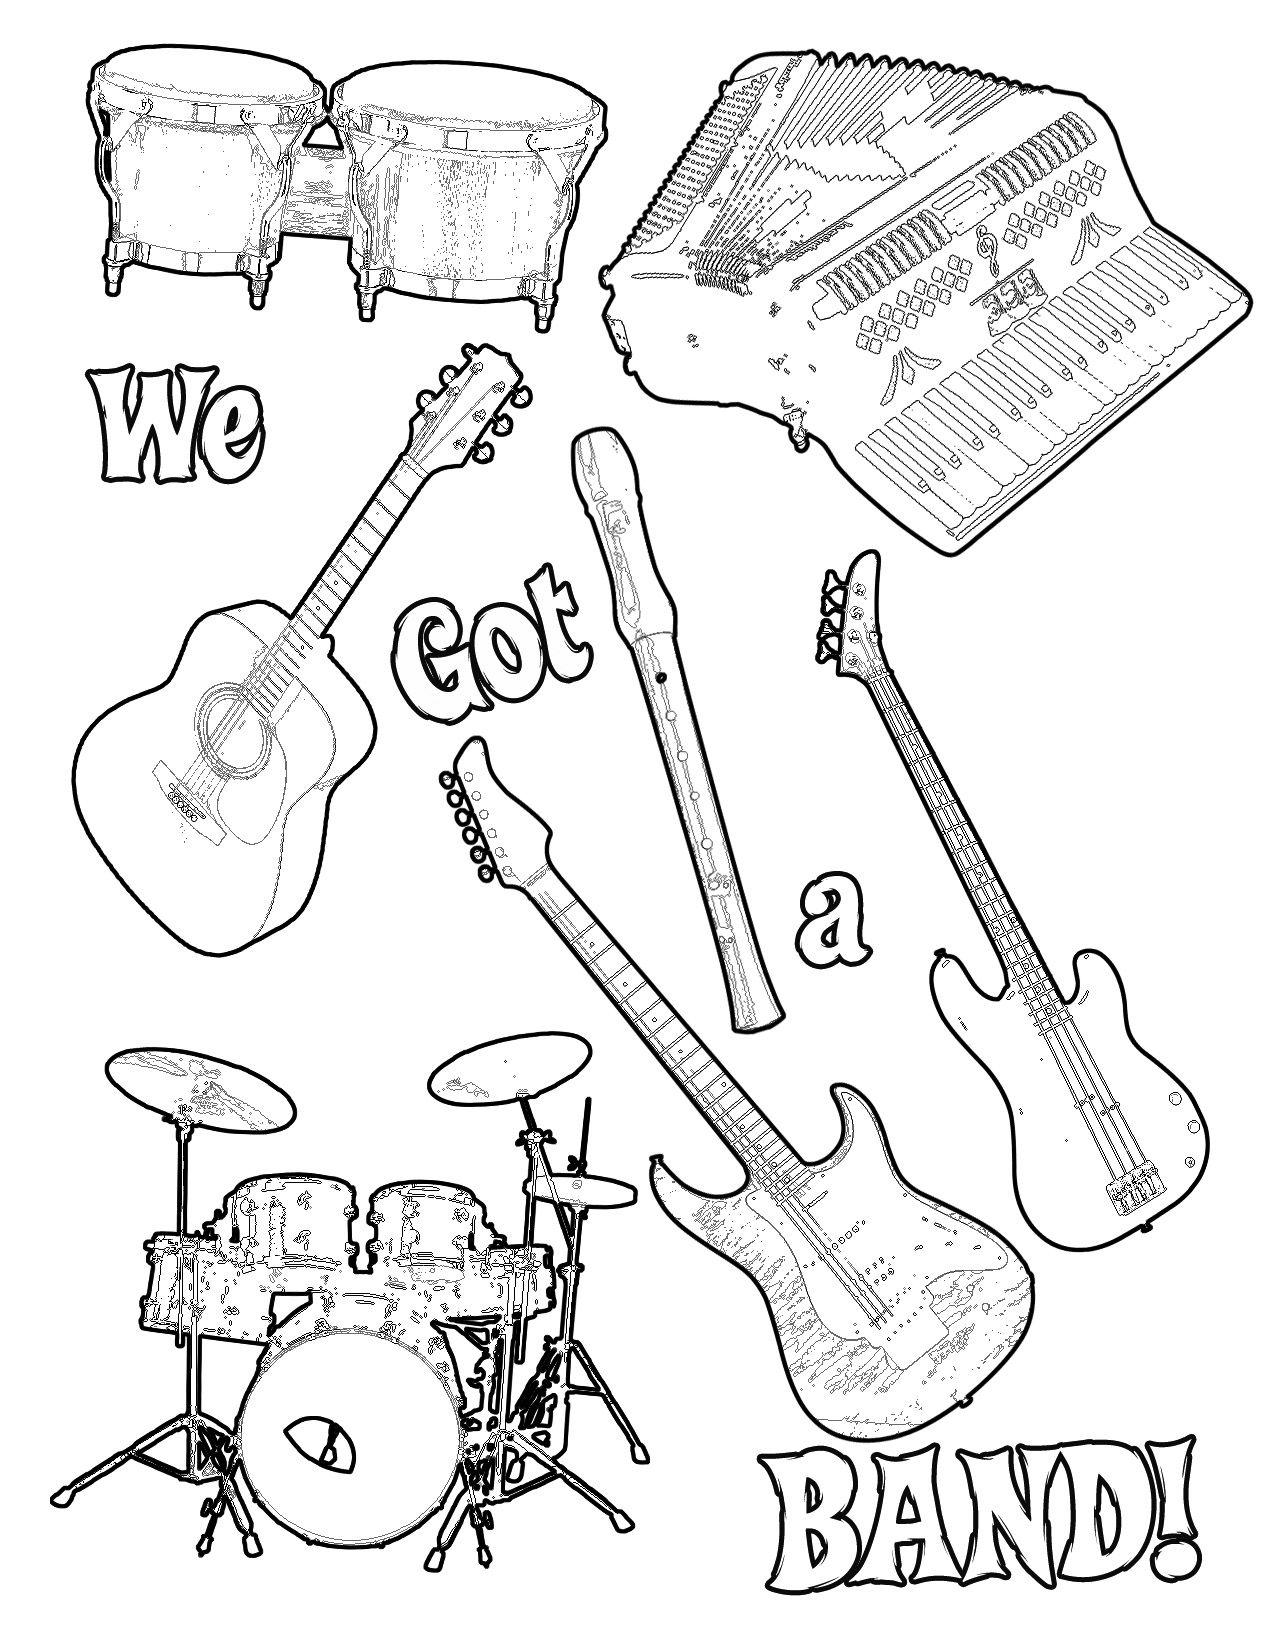 MusicalInstrumentsColoringPicturesForKids2602